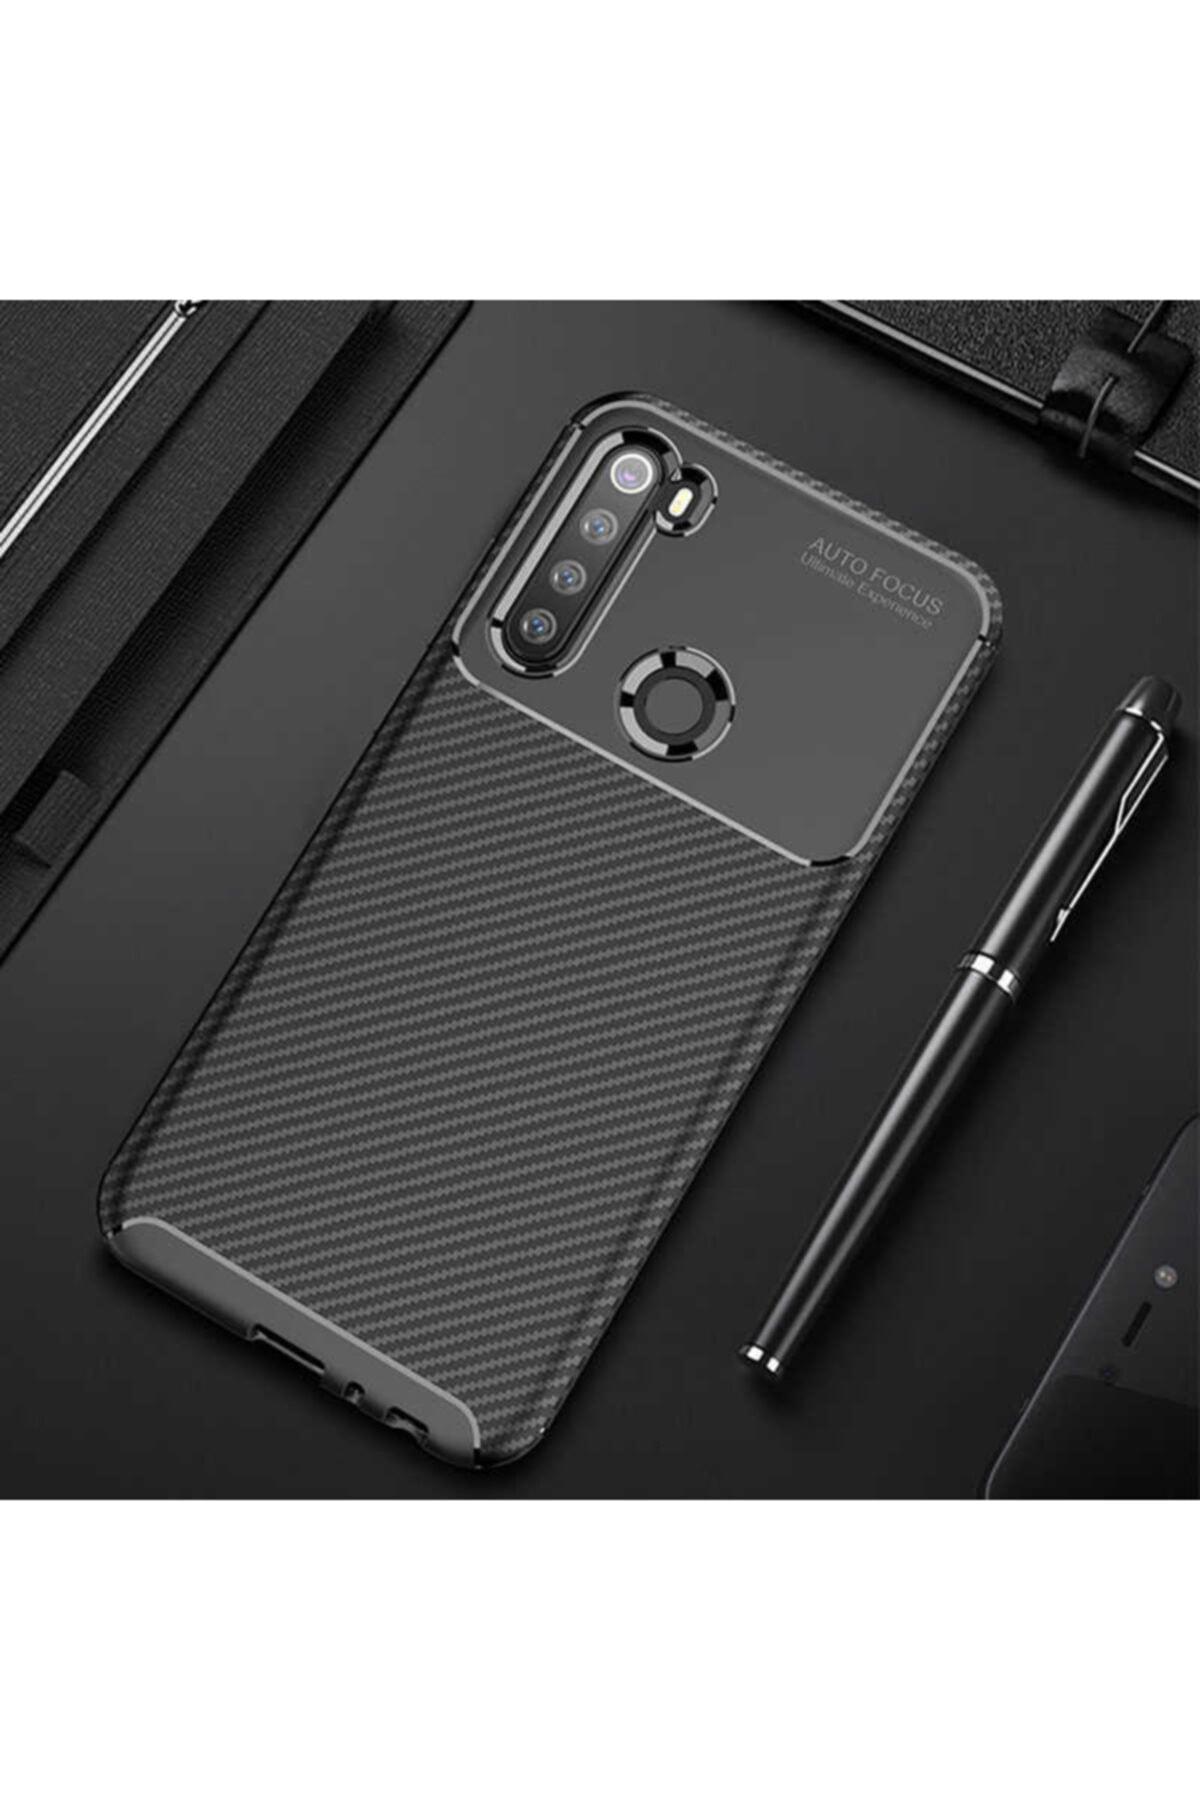 Fibaks Xiaomi Redmi Note 8 Kılıf Rugged Armor Negro Karbon Silikon